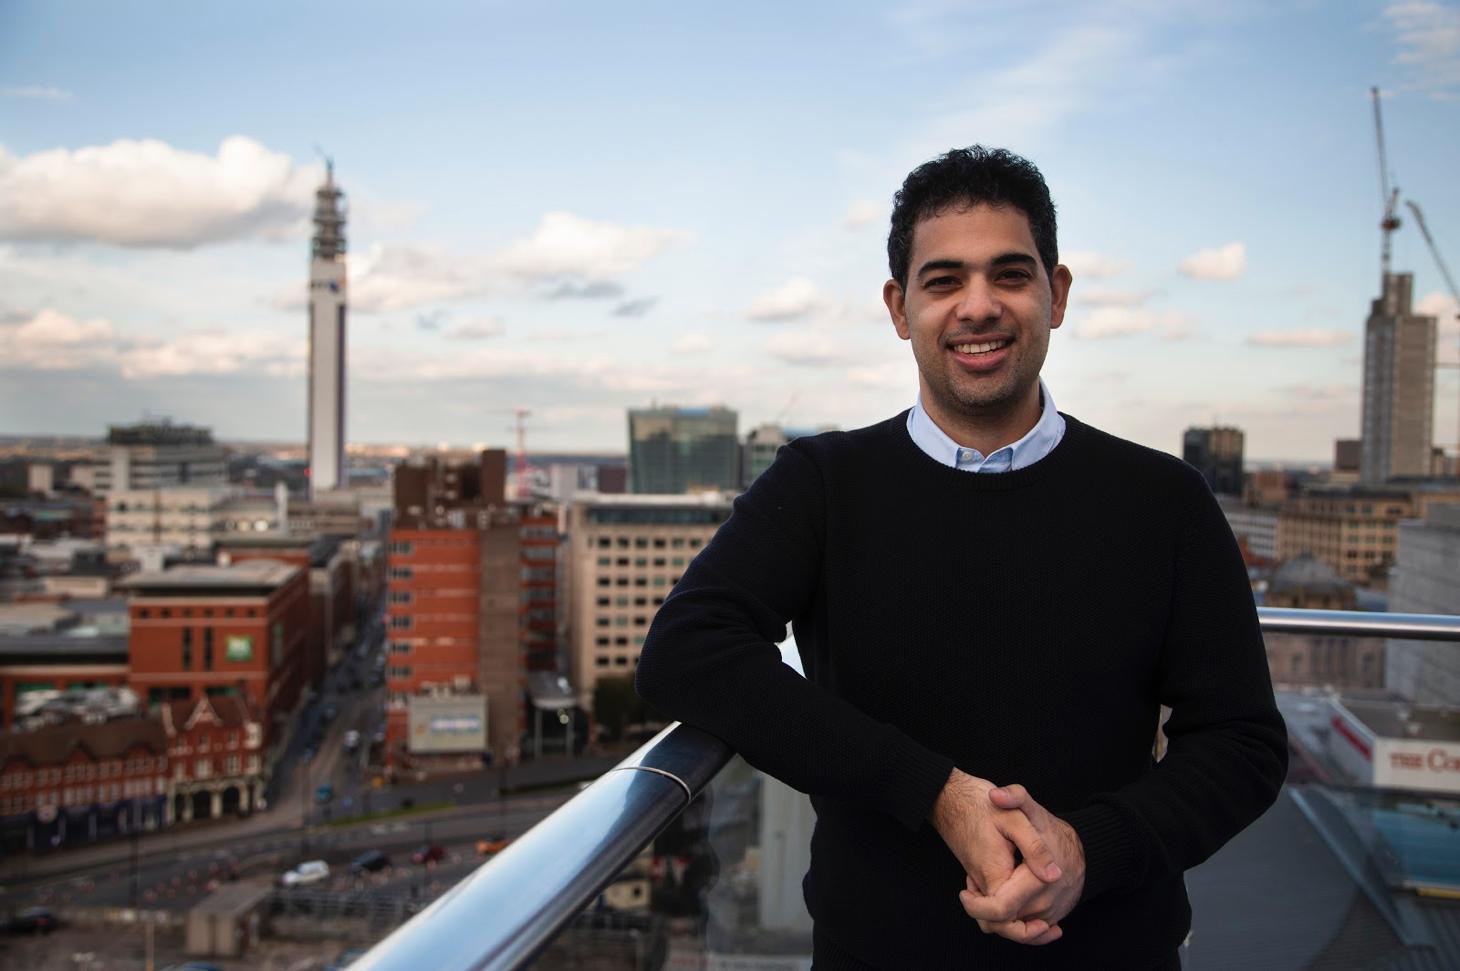 Our West Midlands mayoral candidate Ashvir Sangha